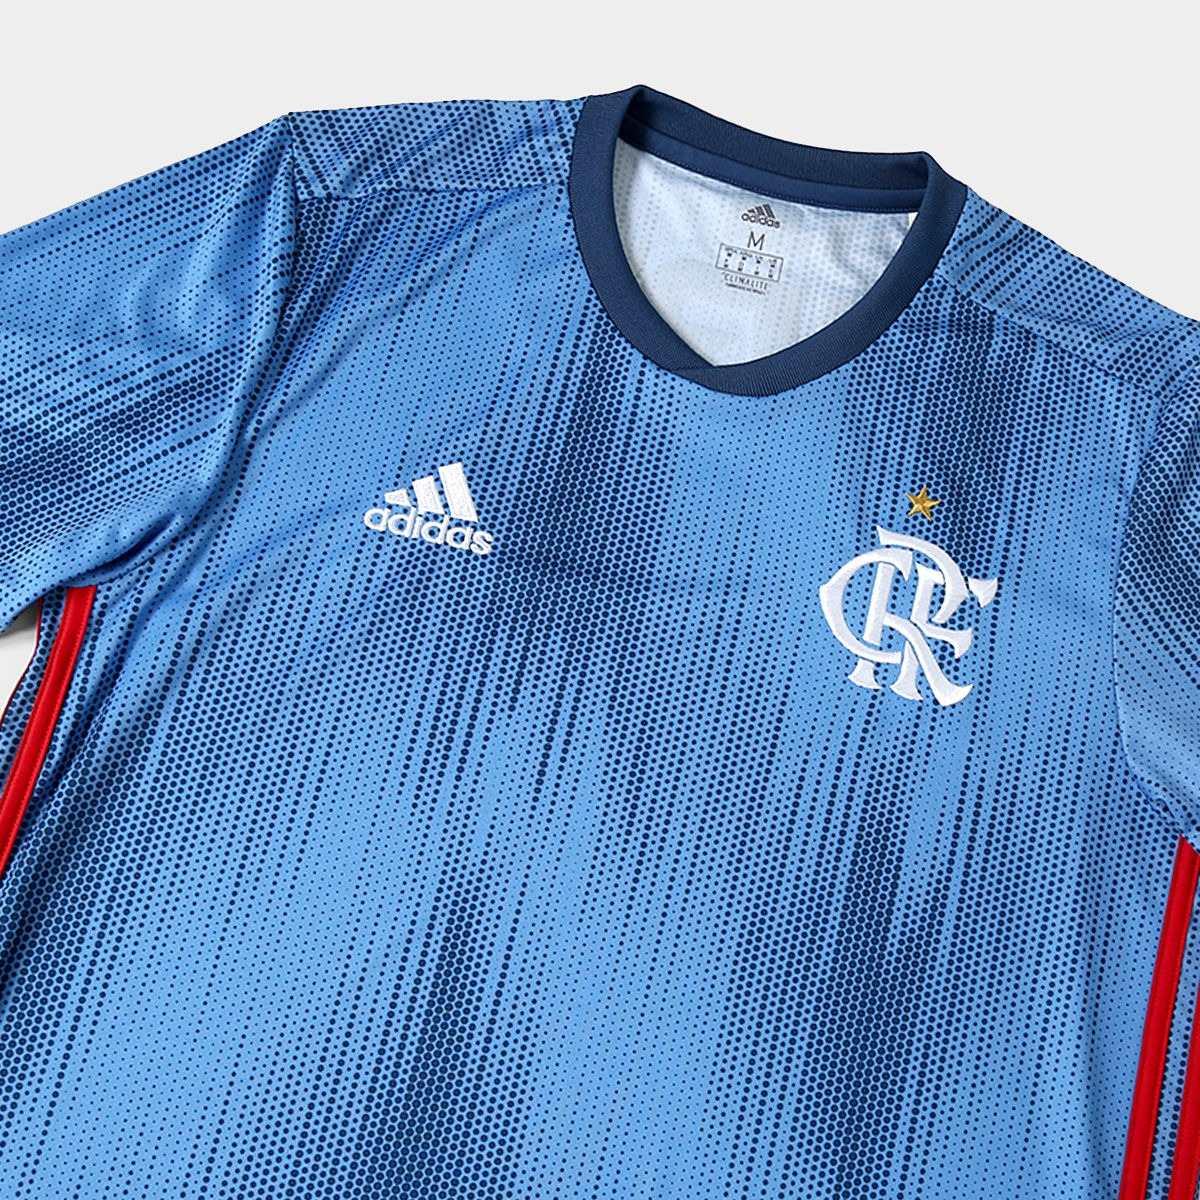 nova camiseta oficial flamengo 2018 19 azul super promoç. Carregando zoom. adf9ba247bacc